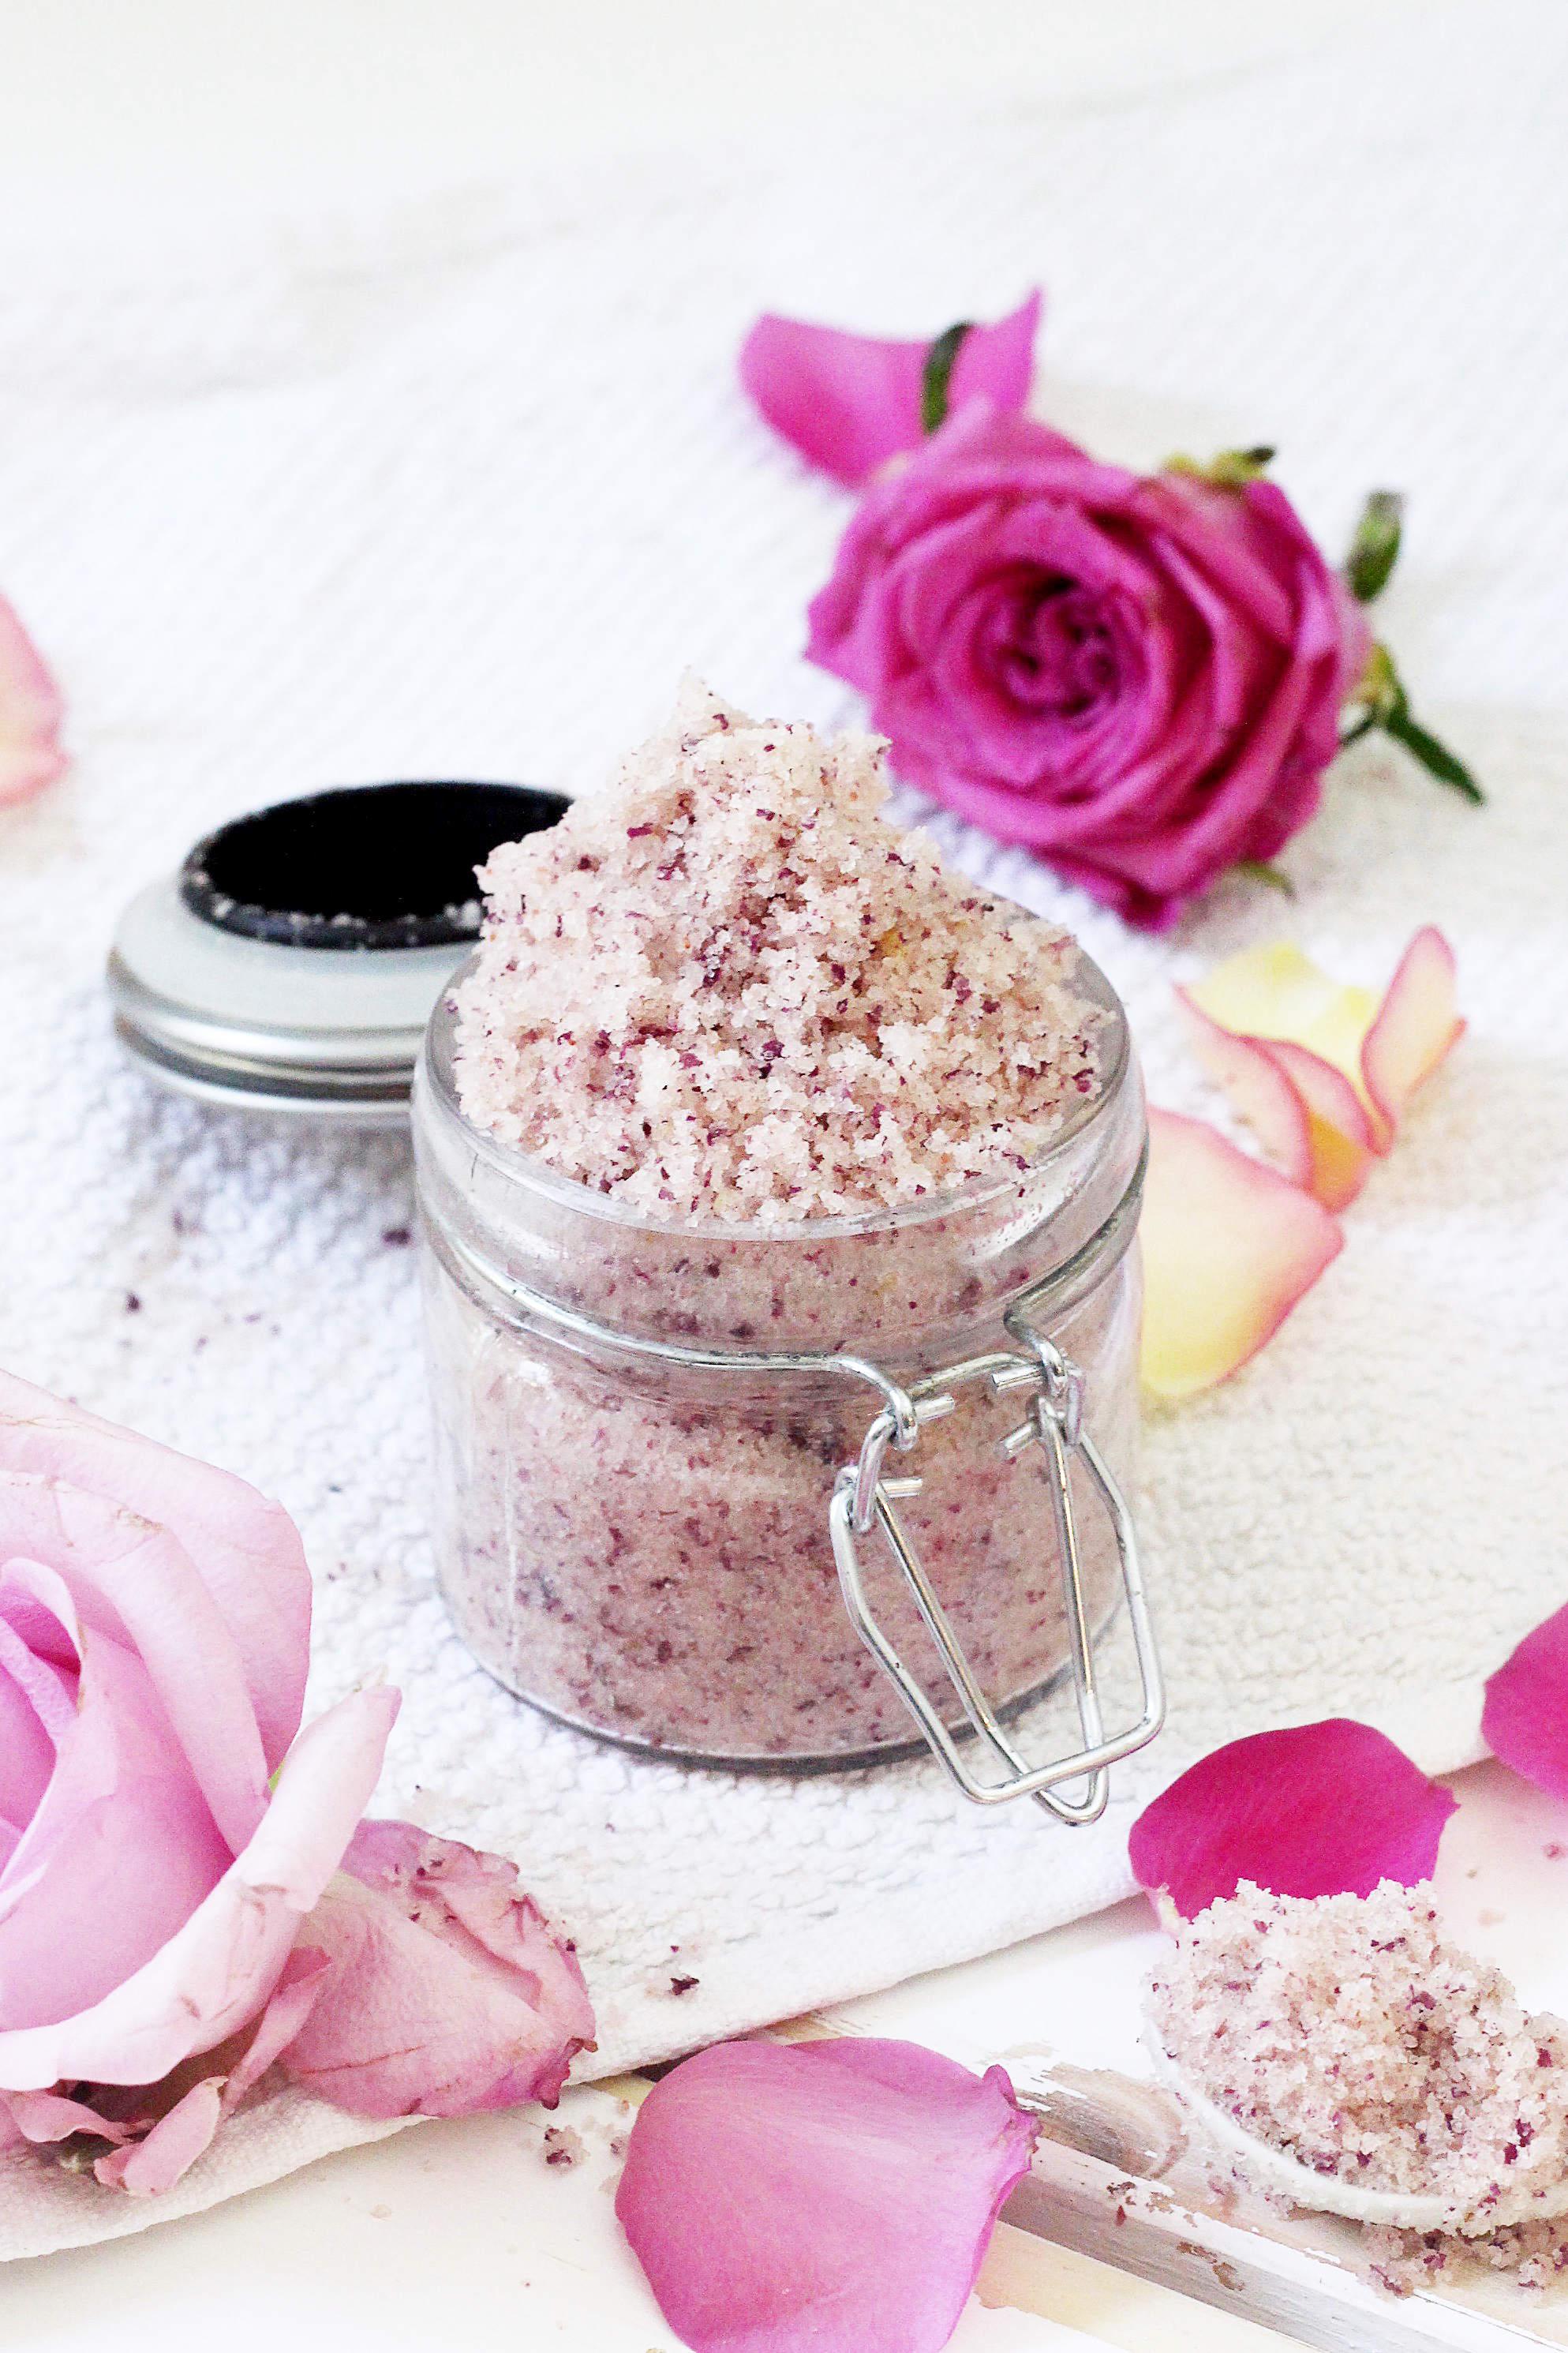 Diy Körperpeeling Mit Rose-mandel Duft Selbermachen Diy Selber Machen